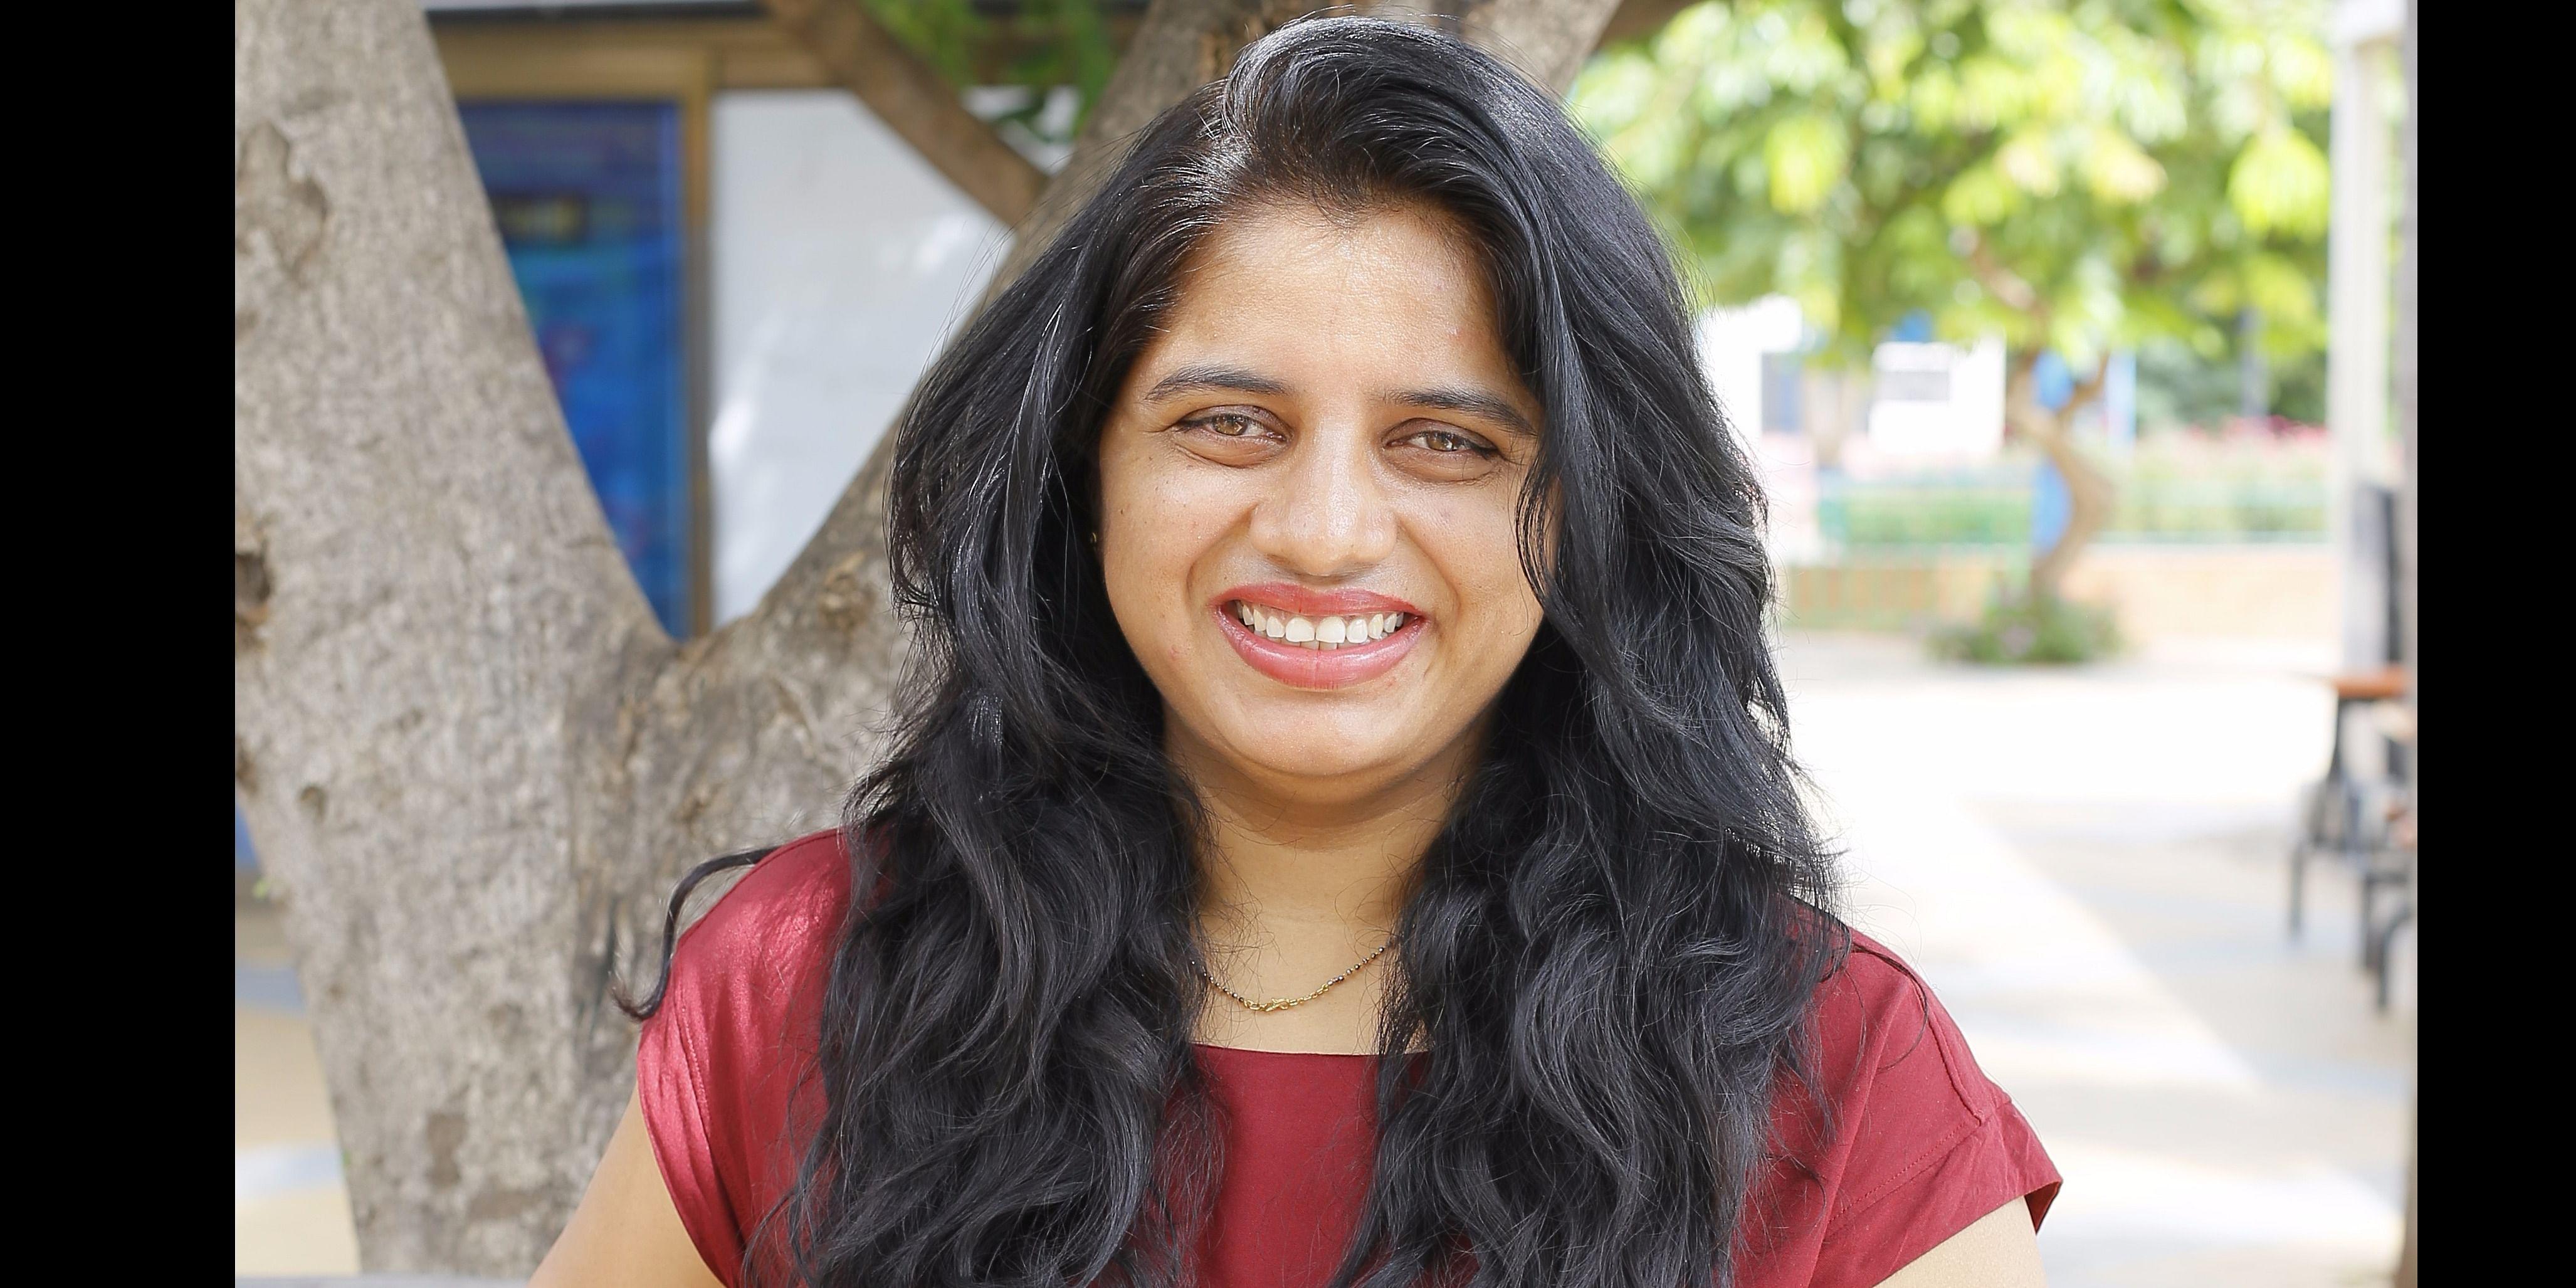 Sandhya Tholi